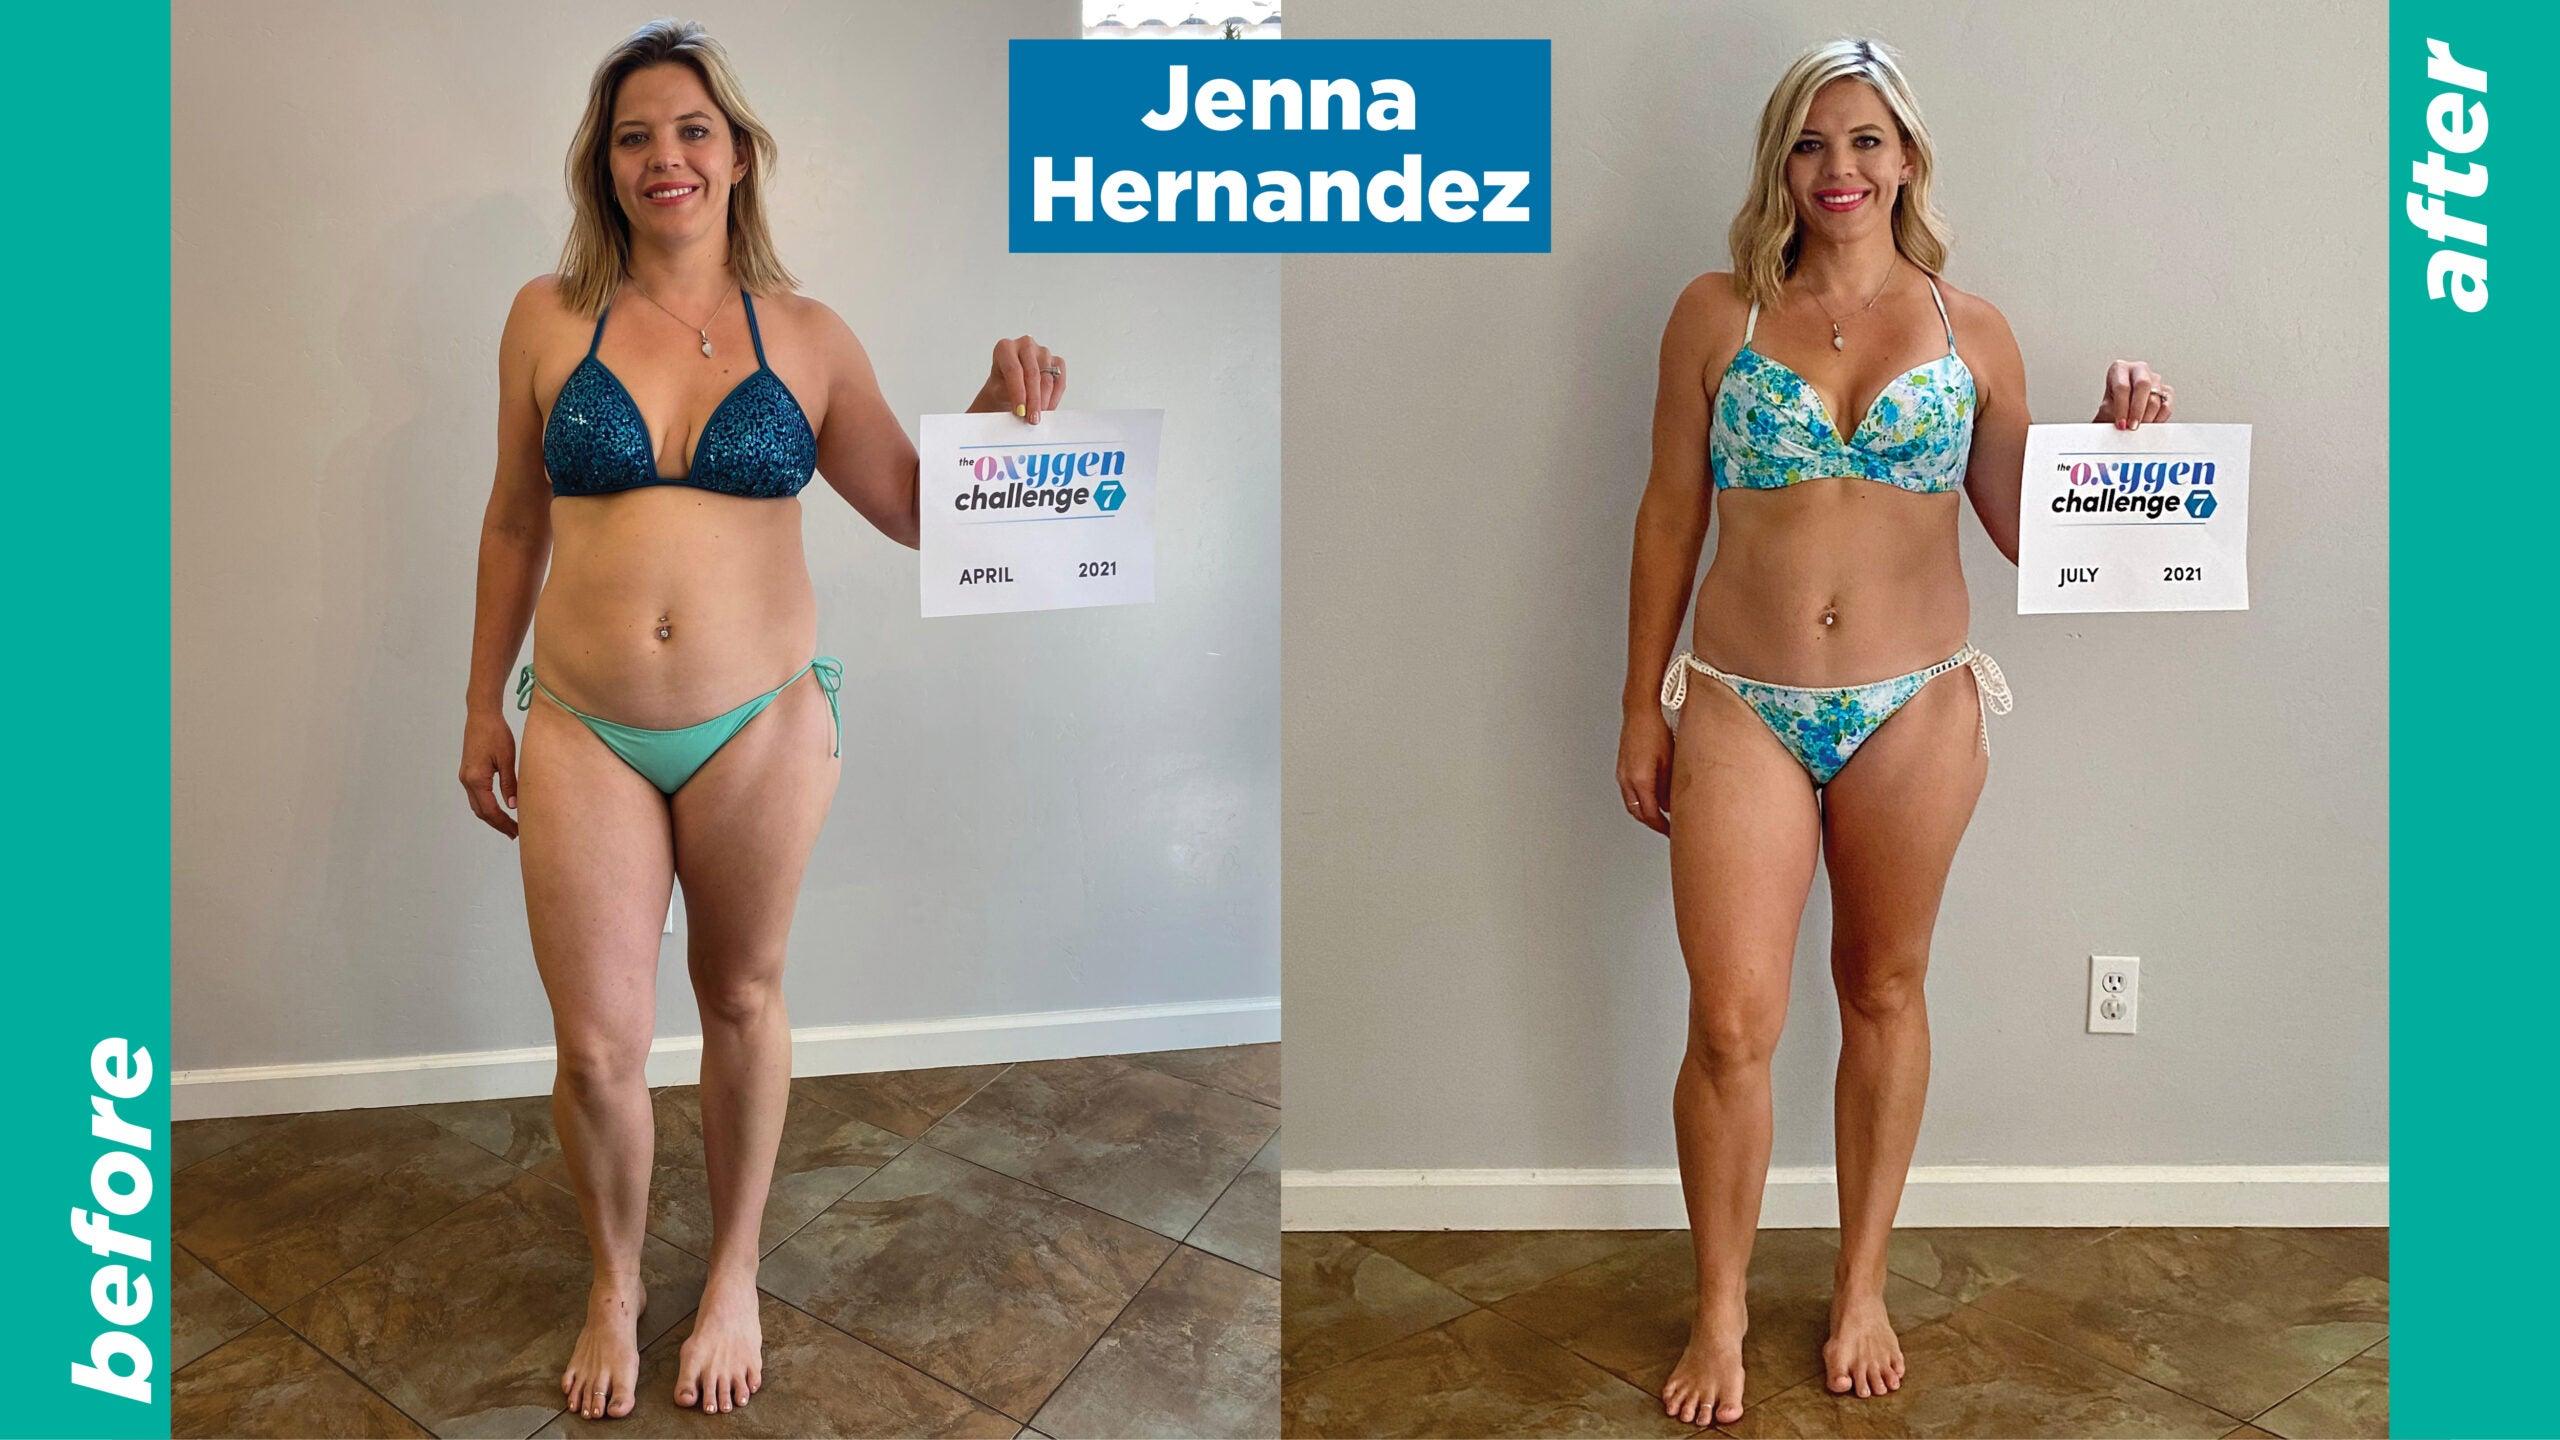 Jenna Hernandez